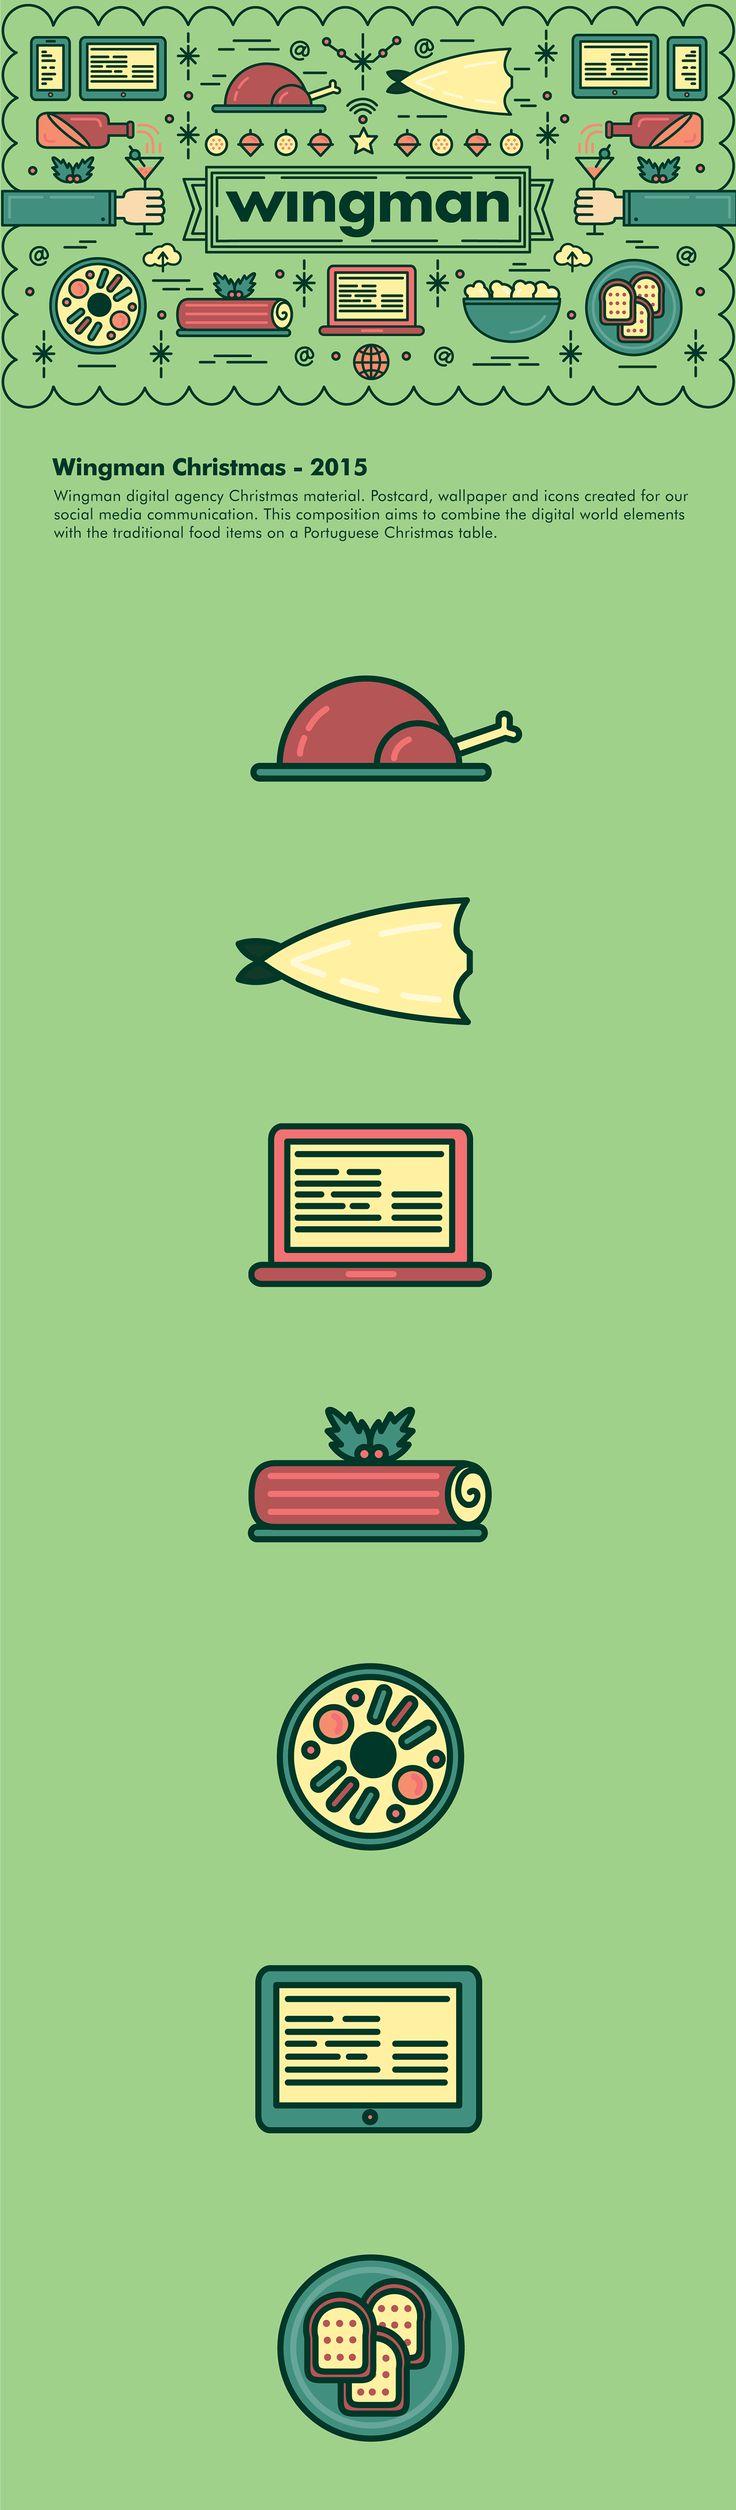 2015 Christmas communication for Wingman digital agency,social networks.